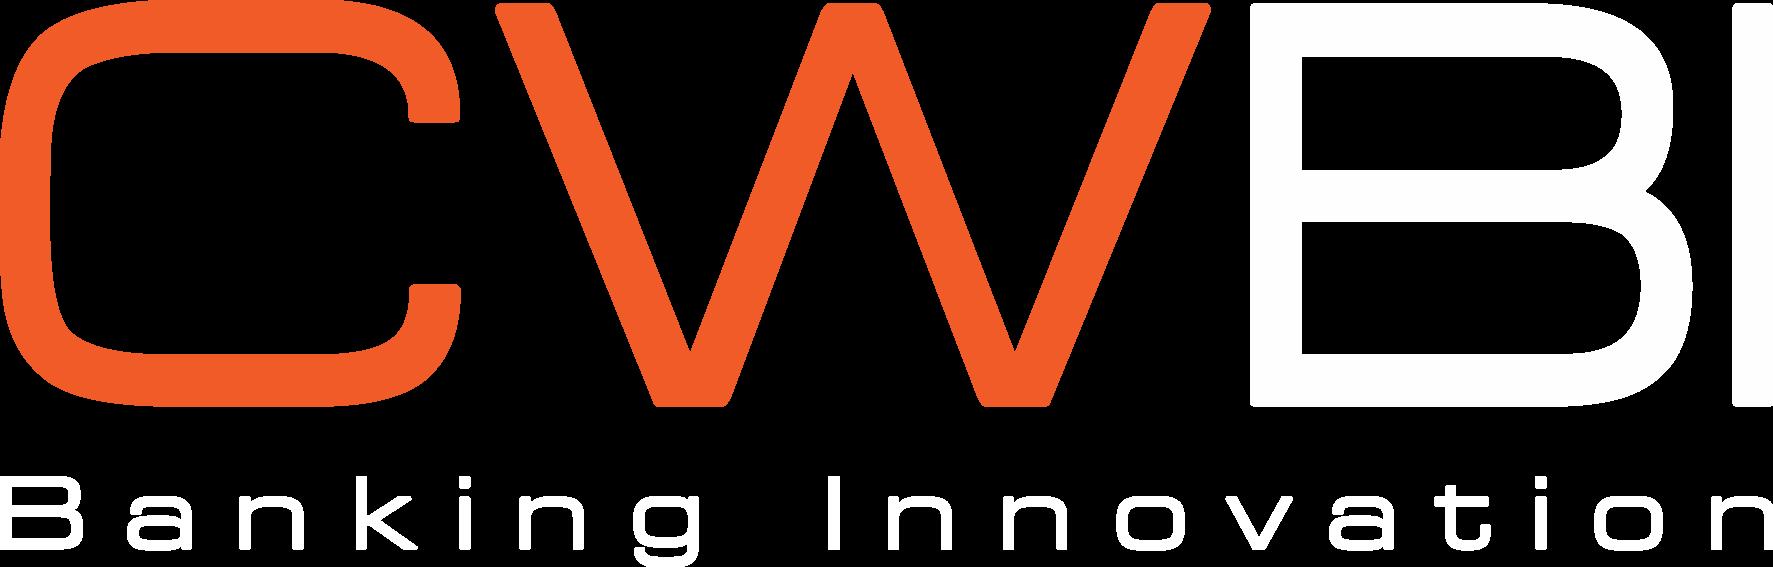 CWBI Codice Web Bank Innovation